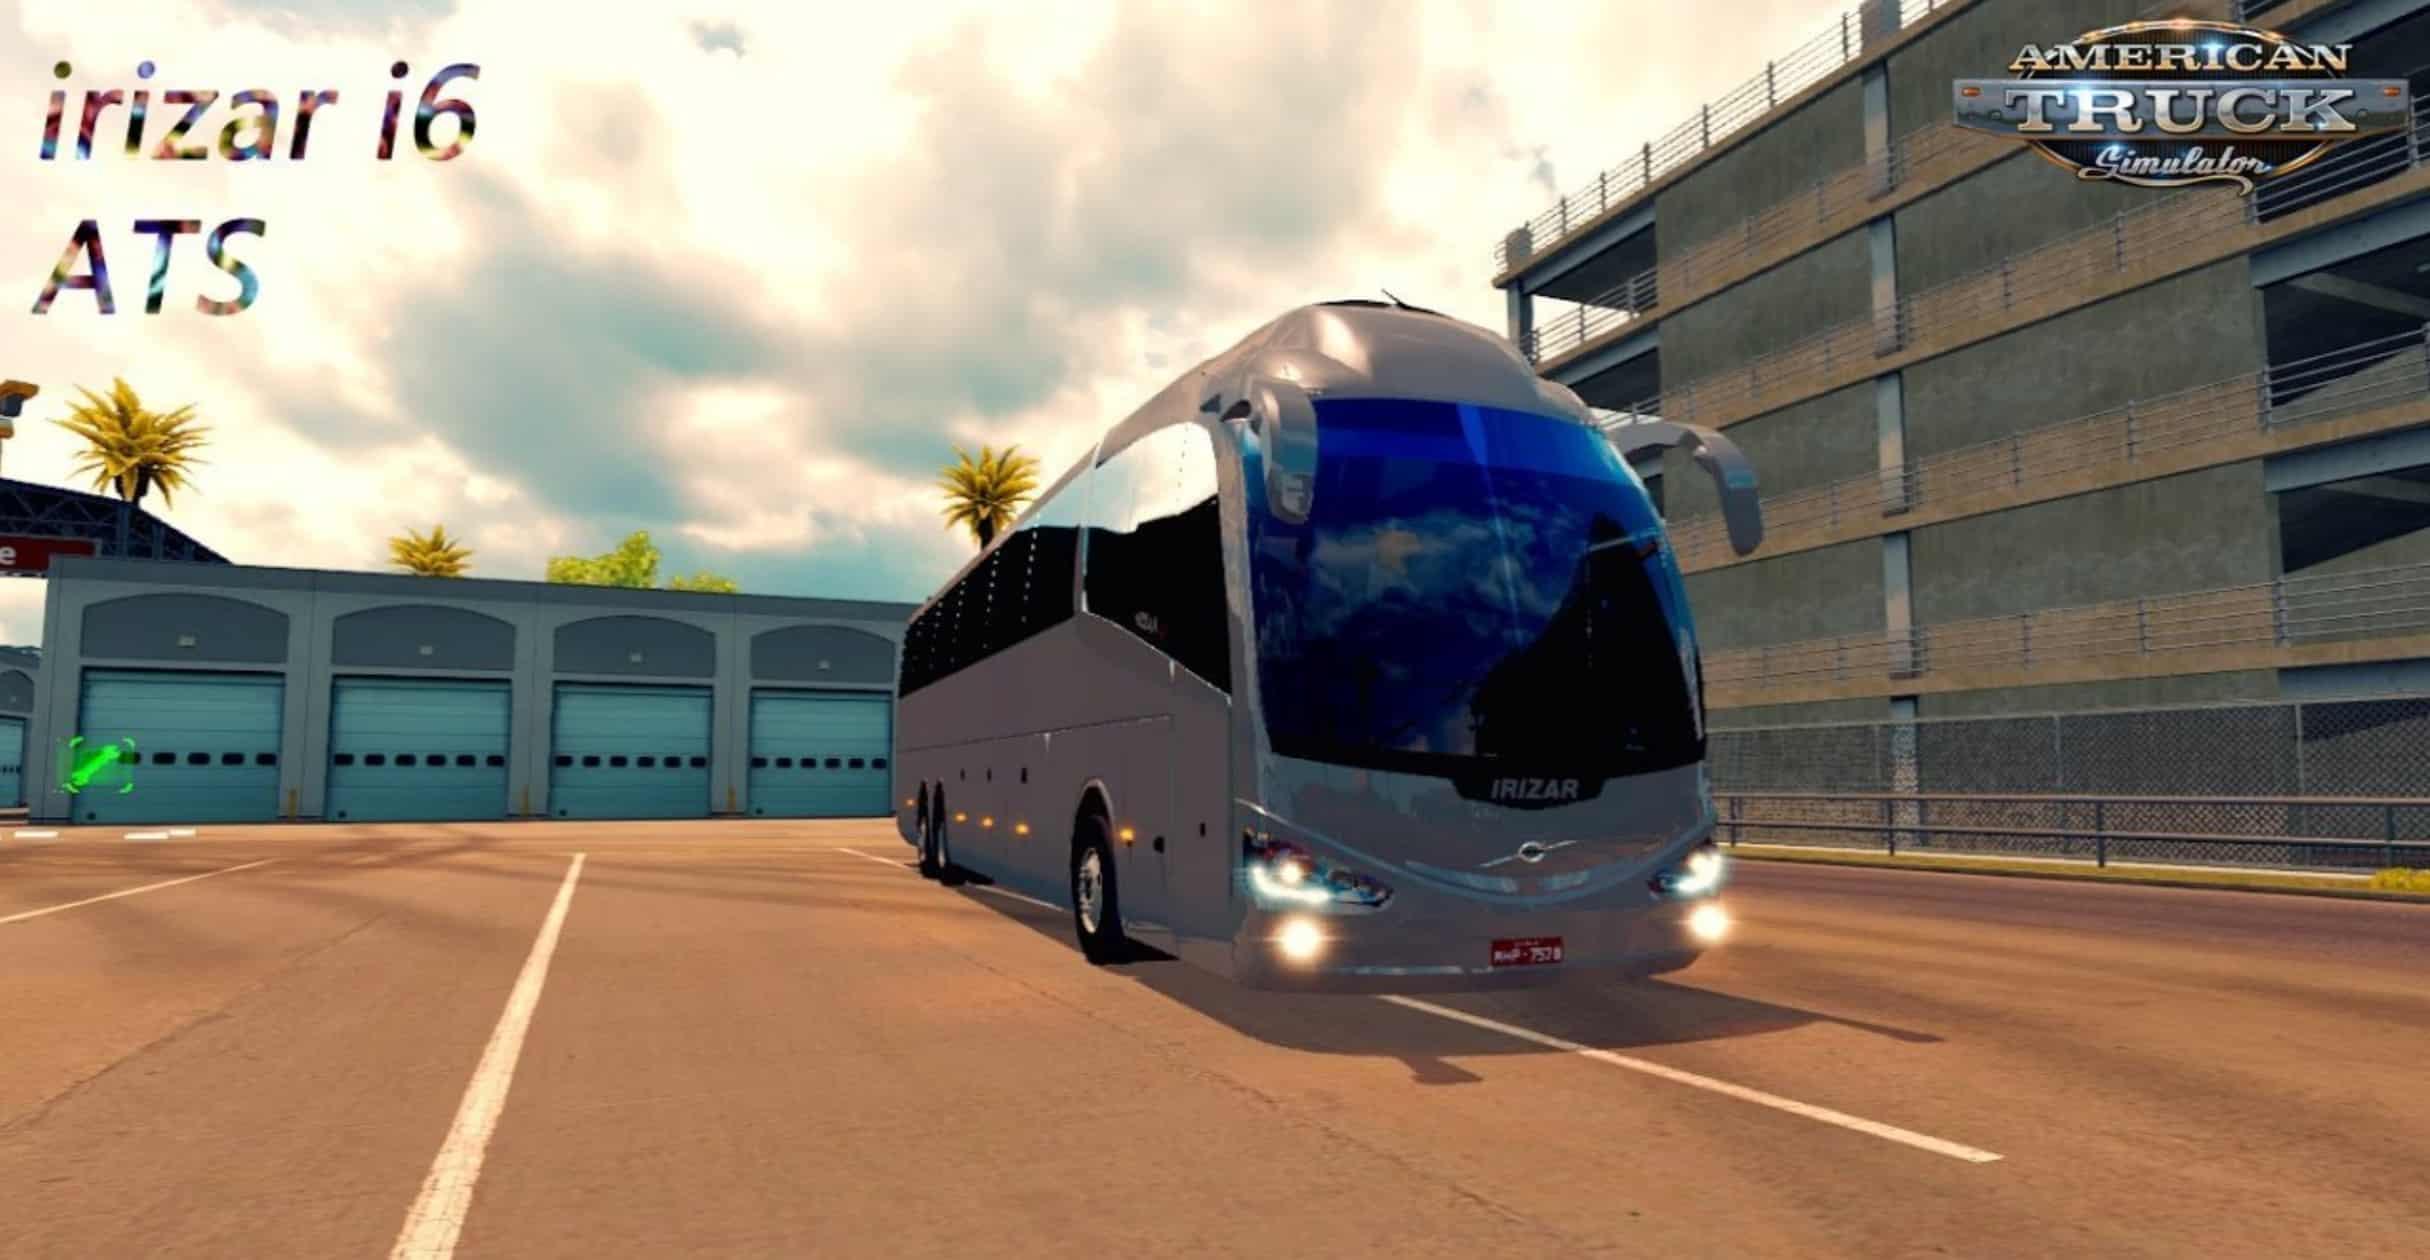 Onibus Volvo Irizar I6 6×2 Bus v1 6 (1 30 x) ATS - American